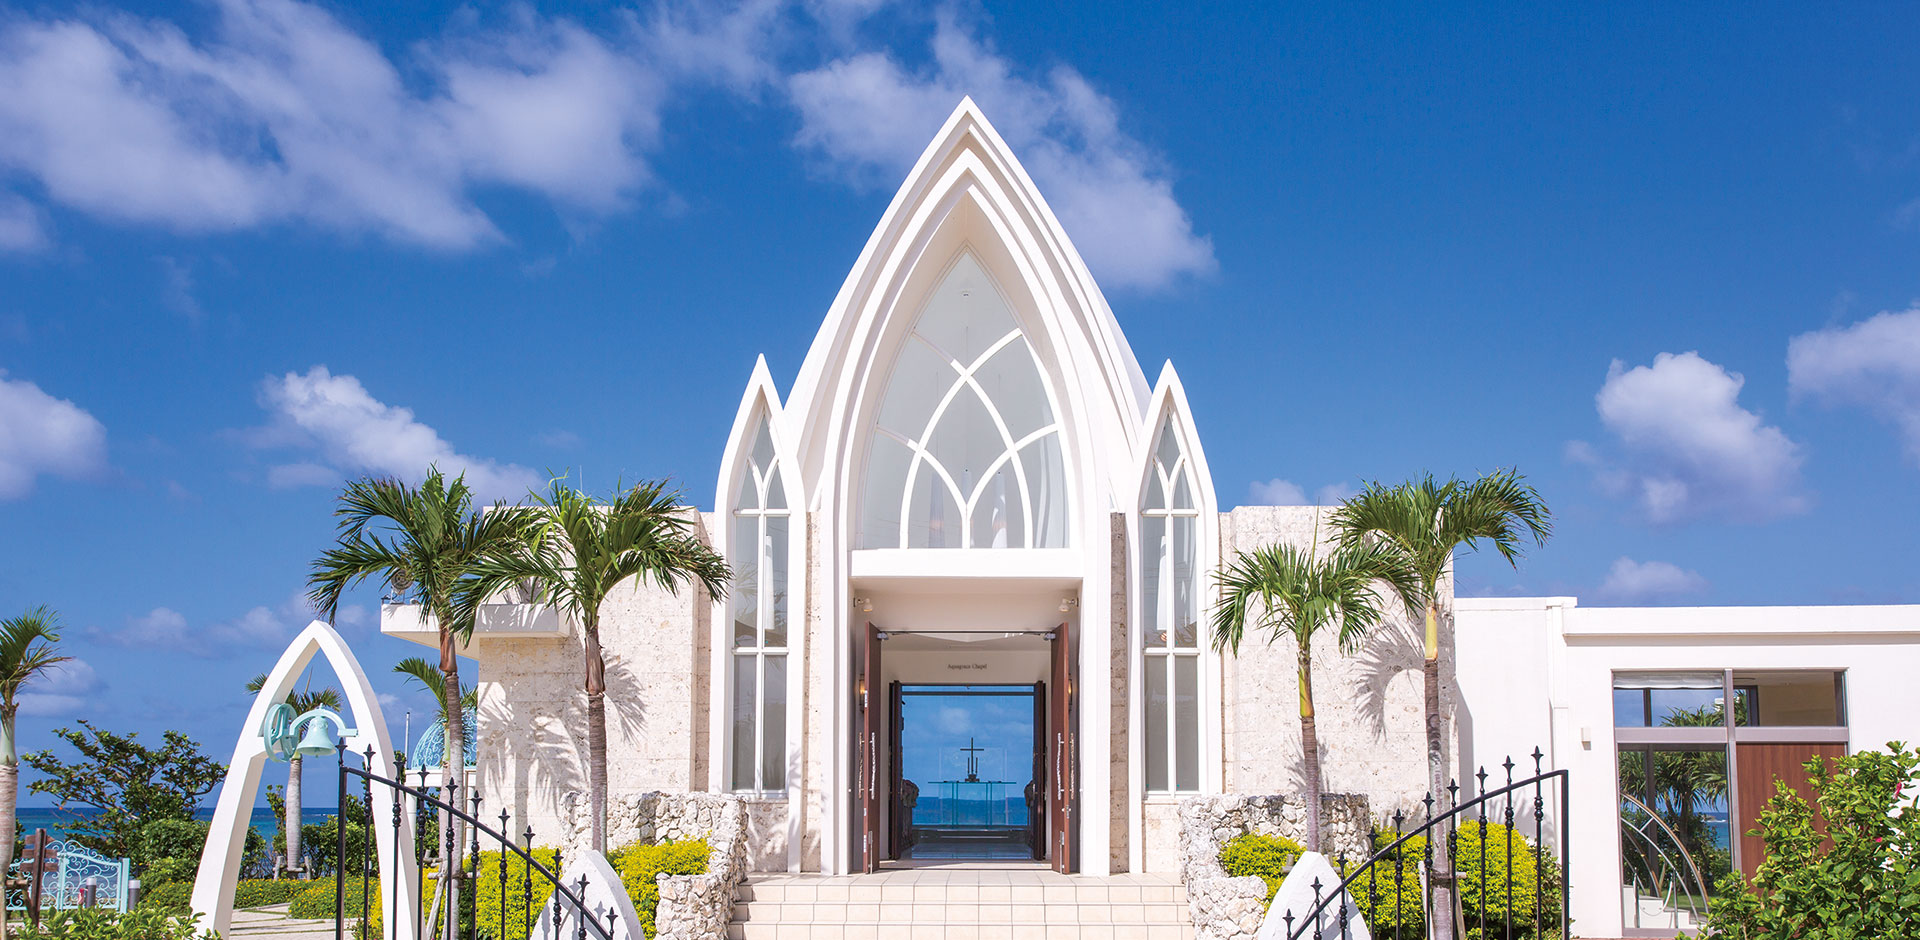 Aquagrace Chapel 艾葵雅教堂-沖繩本島